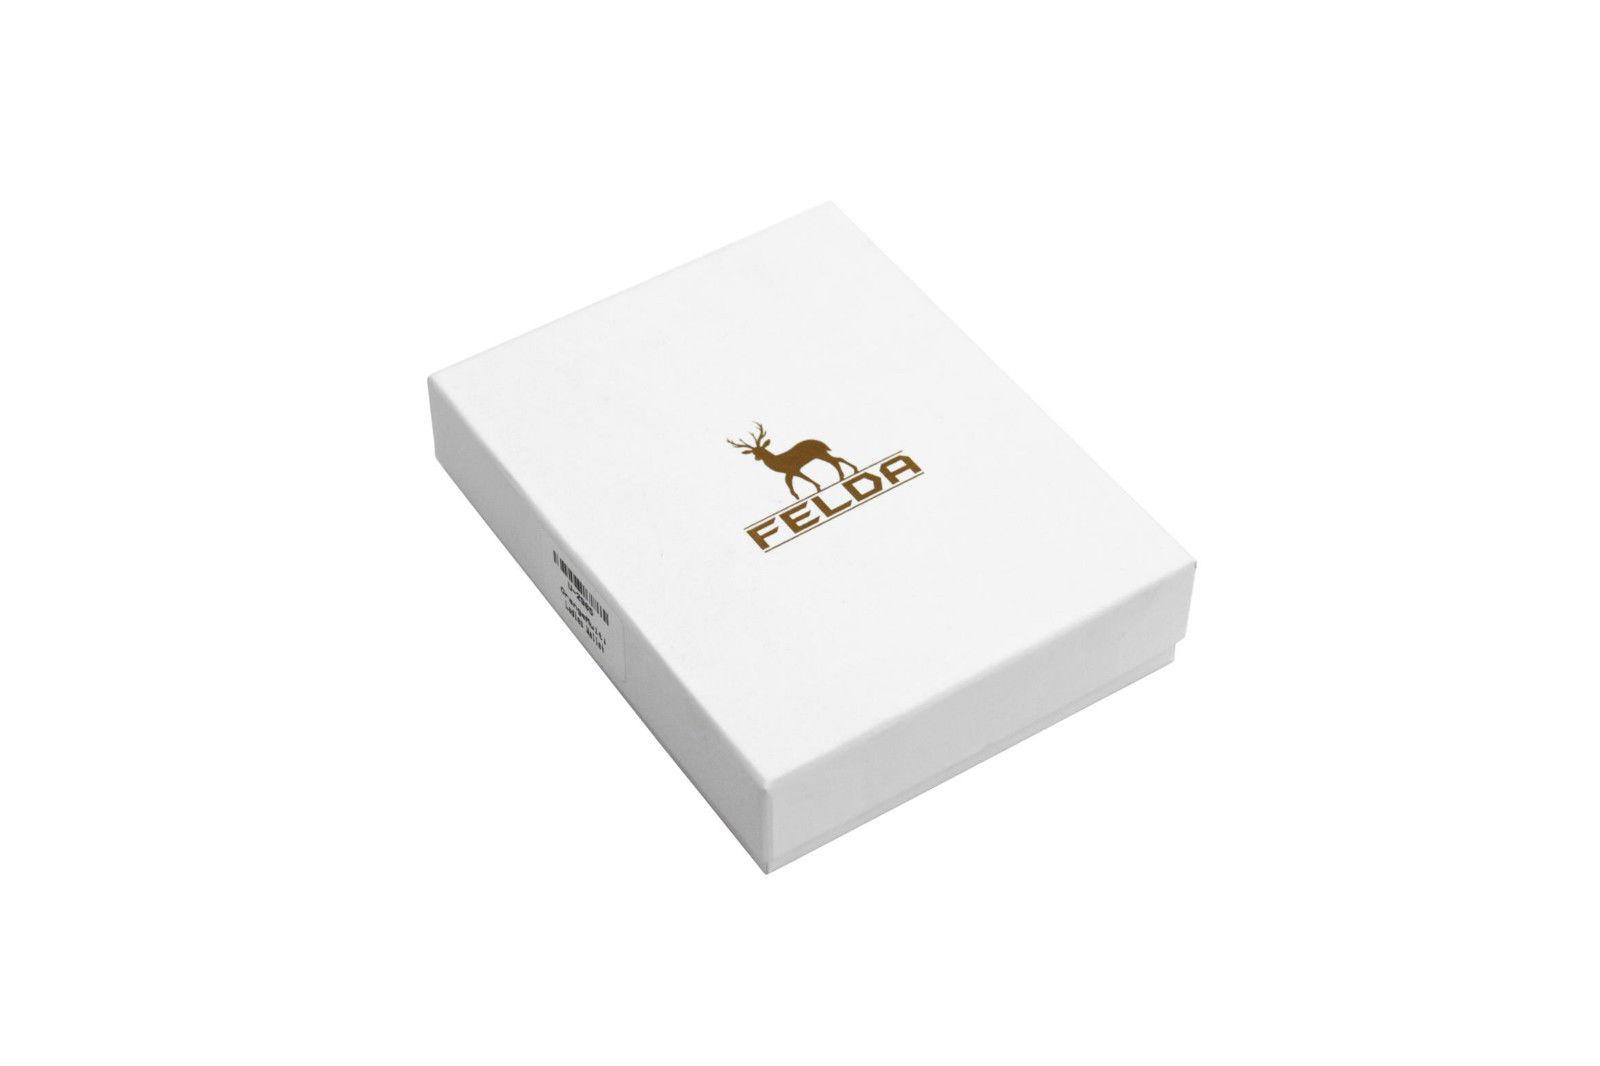 Felda-RFID-onorevoli-MEDAGLIA-amp-Card-Purse-Wallet-Genuine-Leather-Multi-SOFT-BOX-REGALO miniatura 21